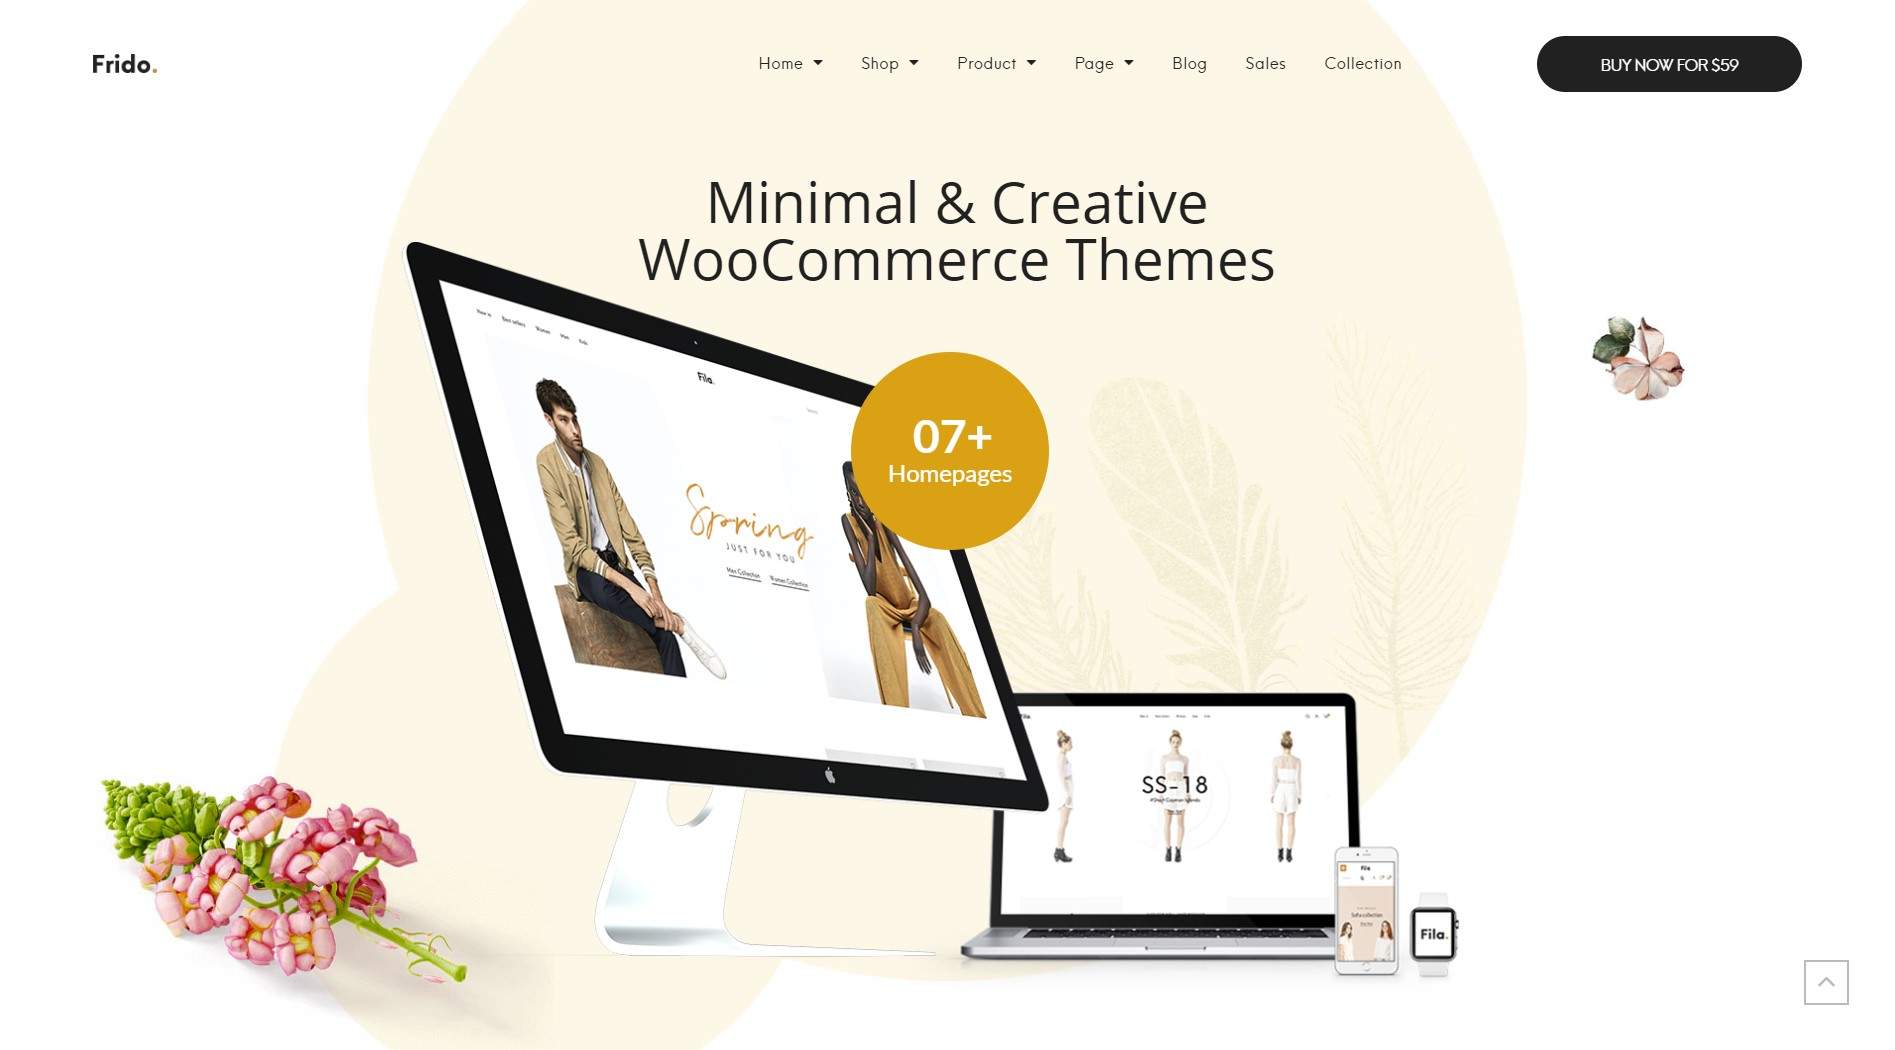 Frido Fashion WordPress Theme